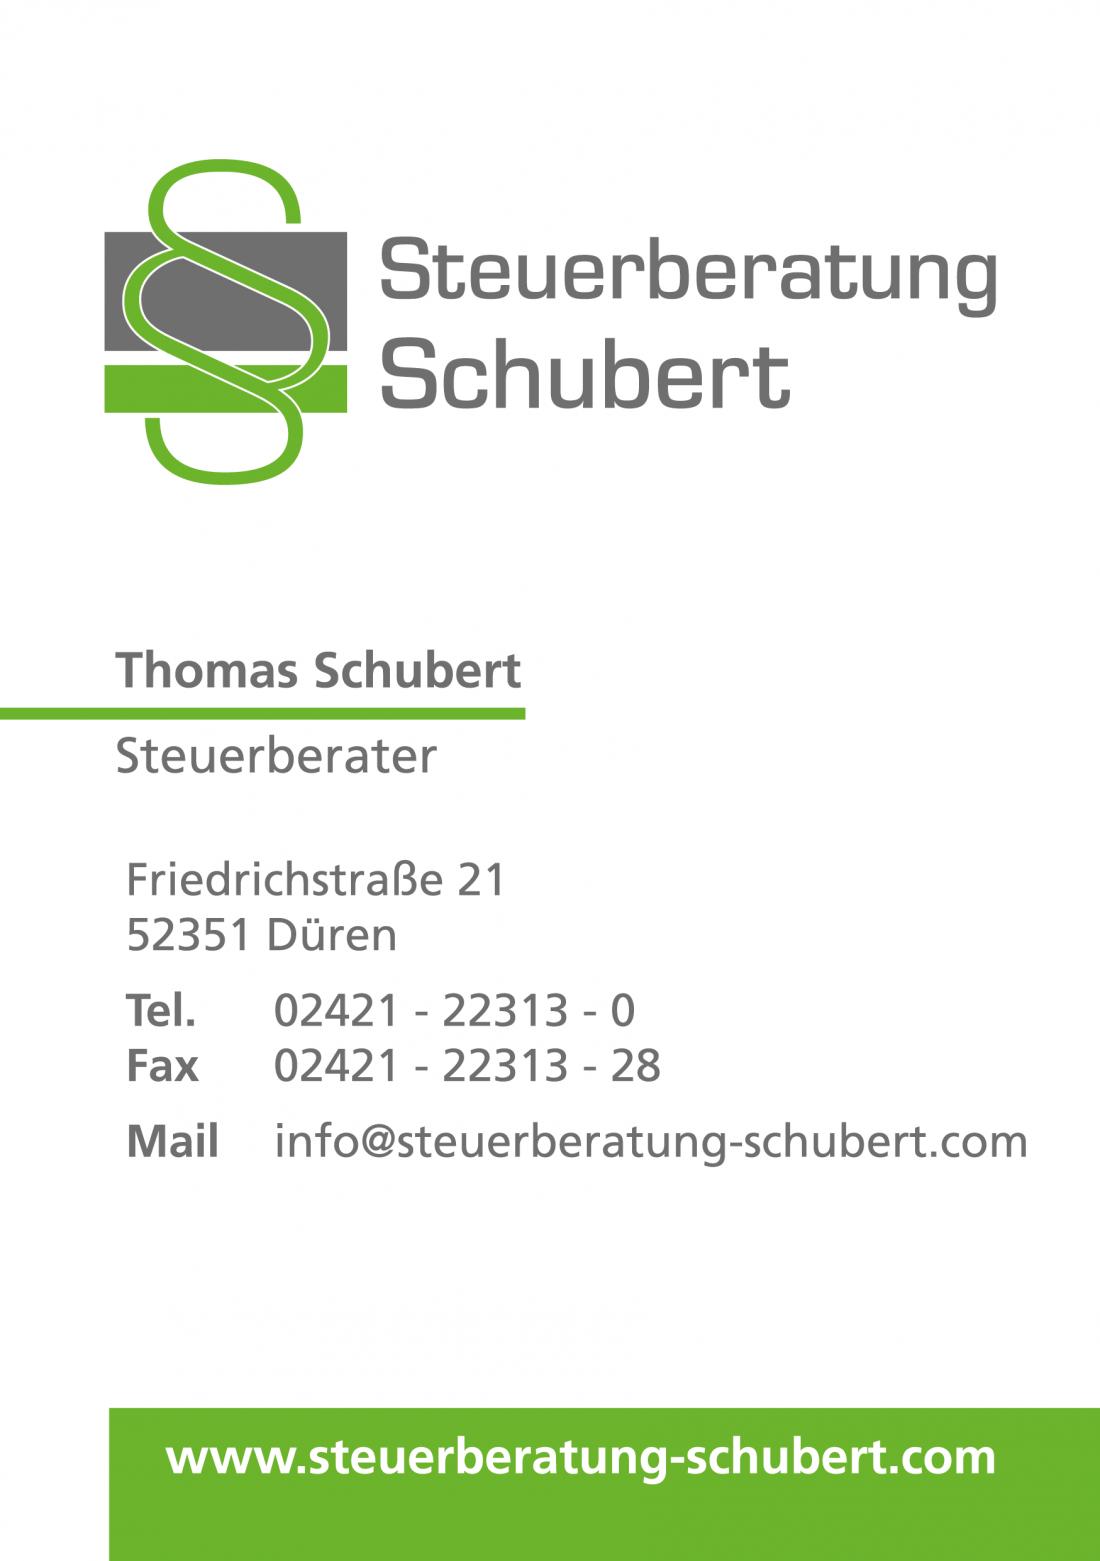 Thomas Schubert